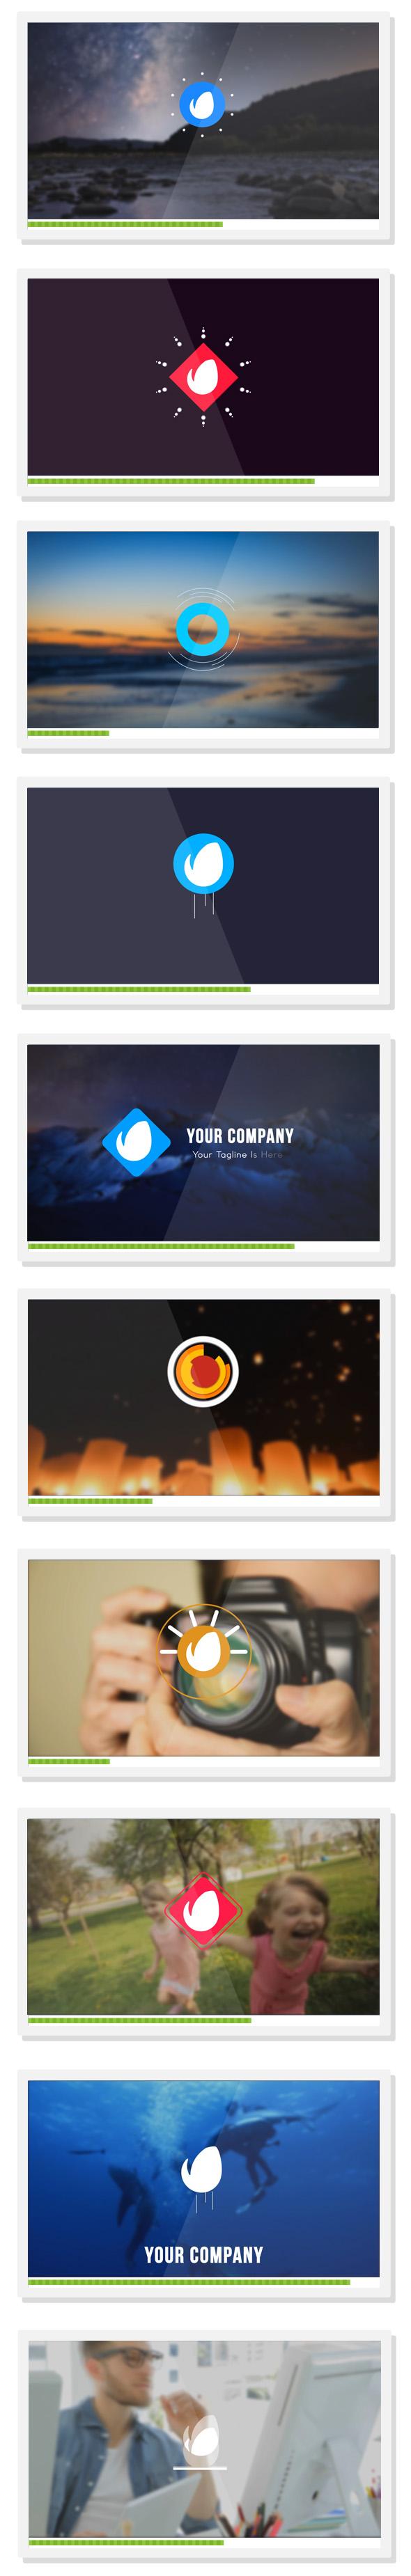 features-quick logo reveal